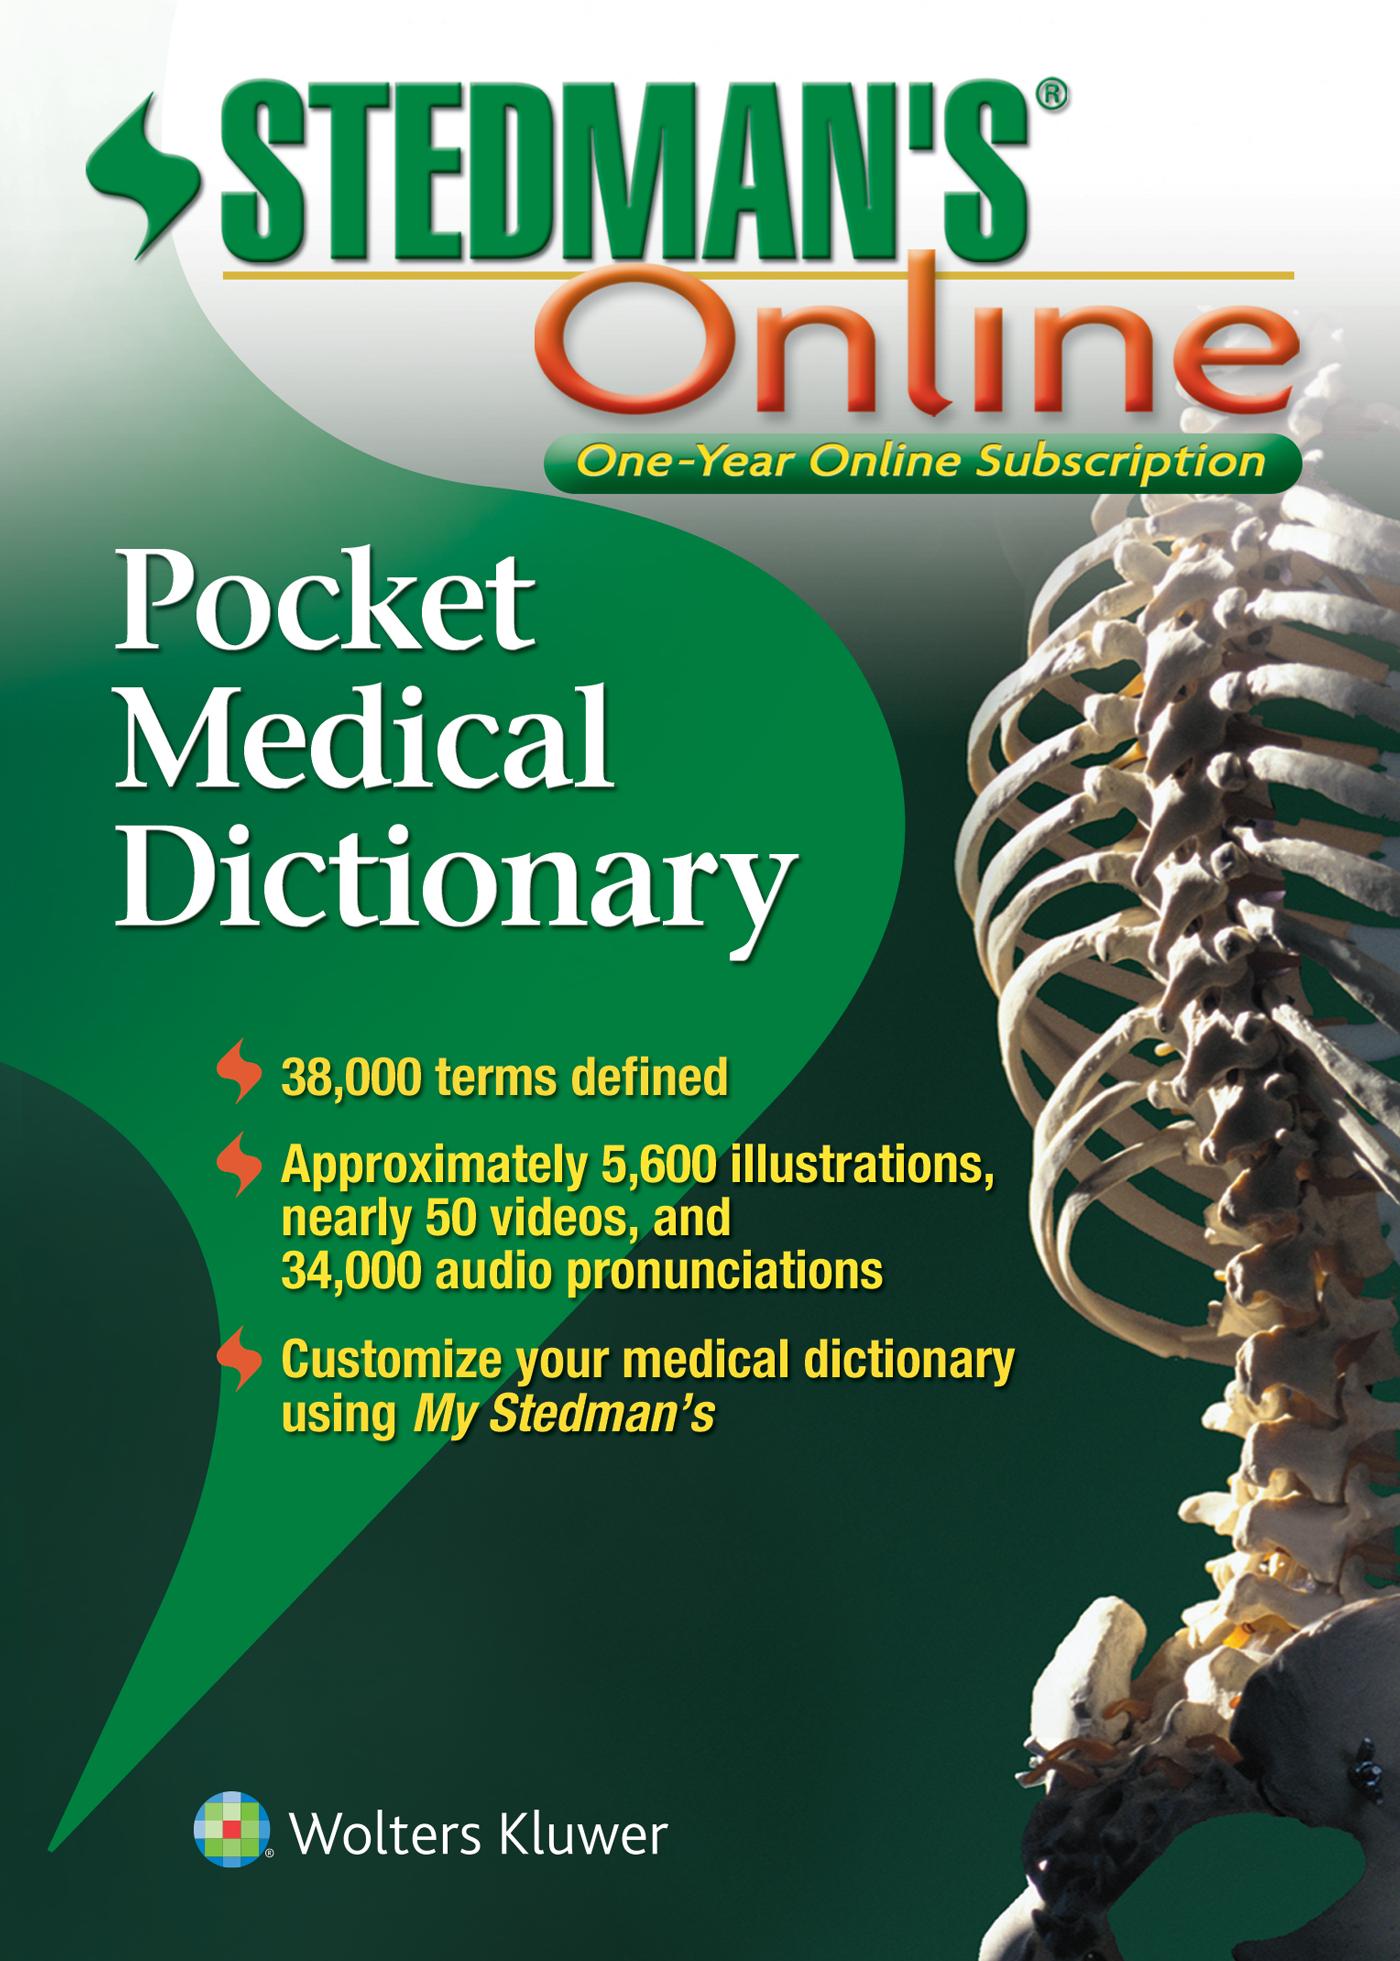 Stedman's Pocket Medical Dictionary book cover